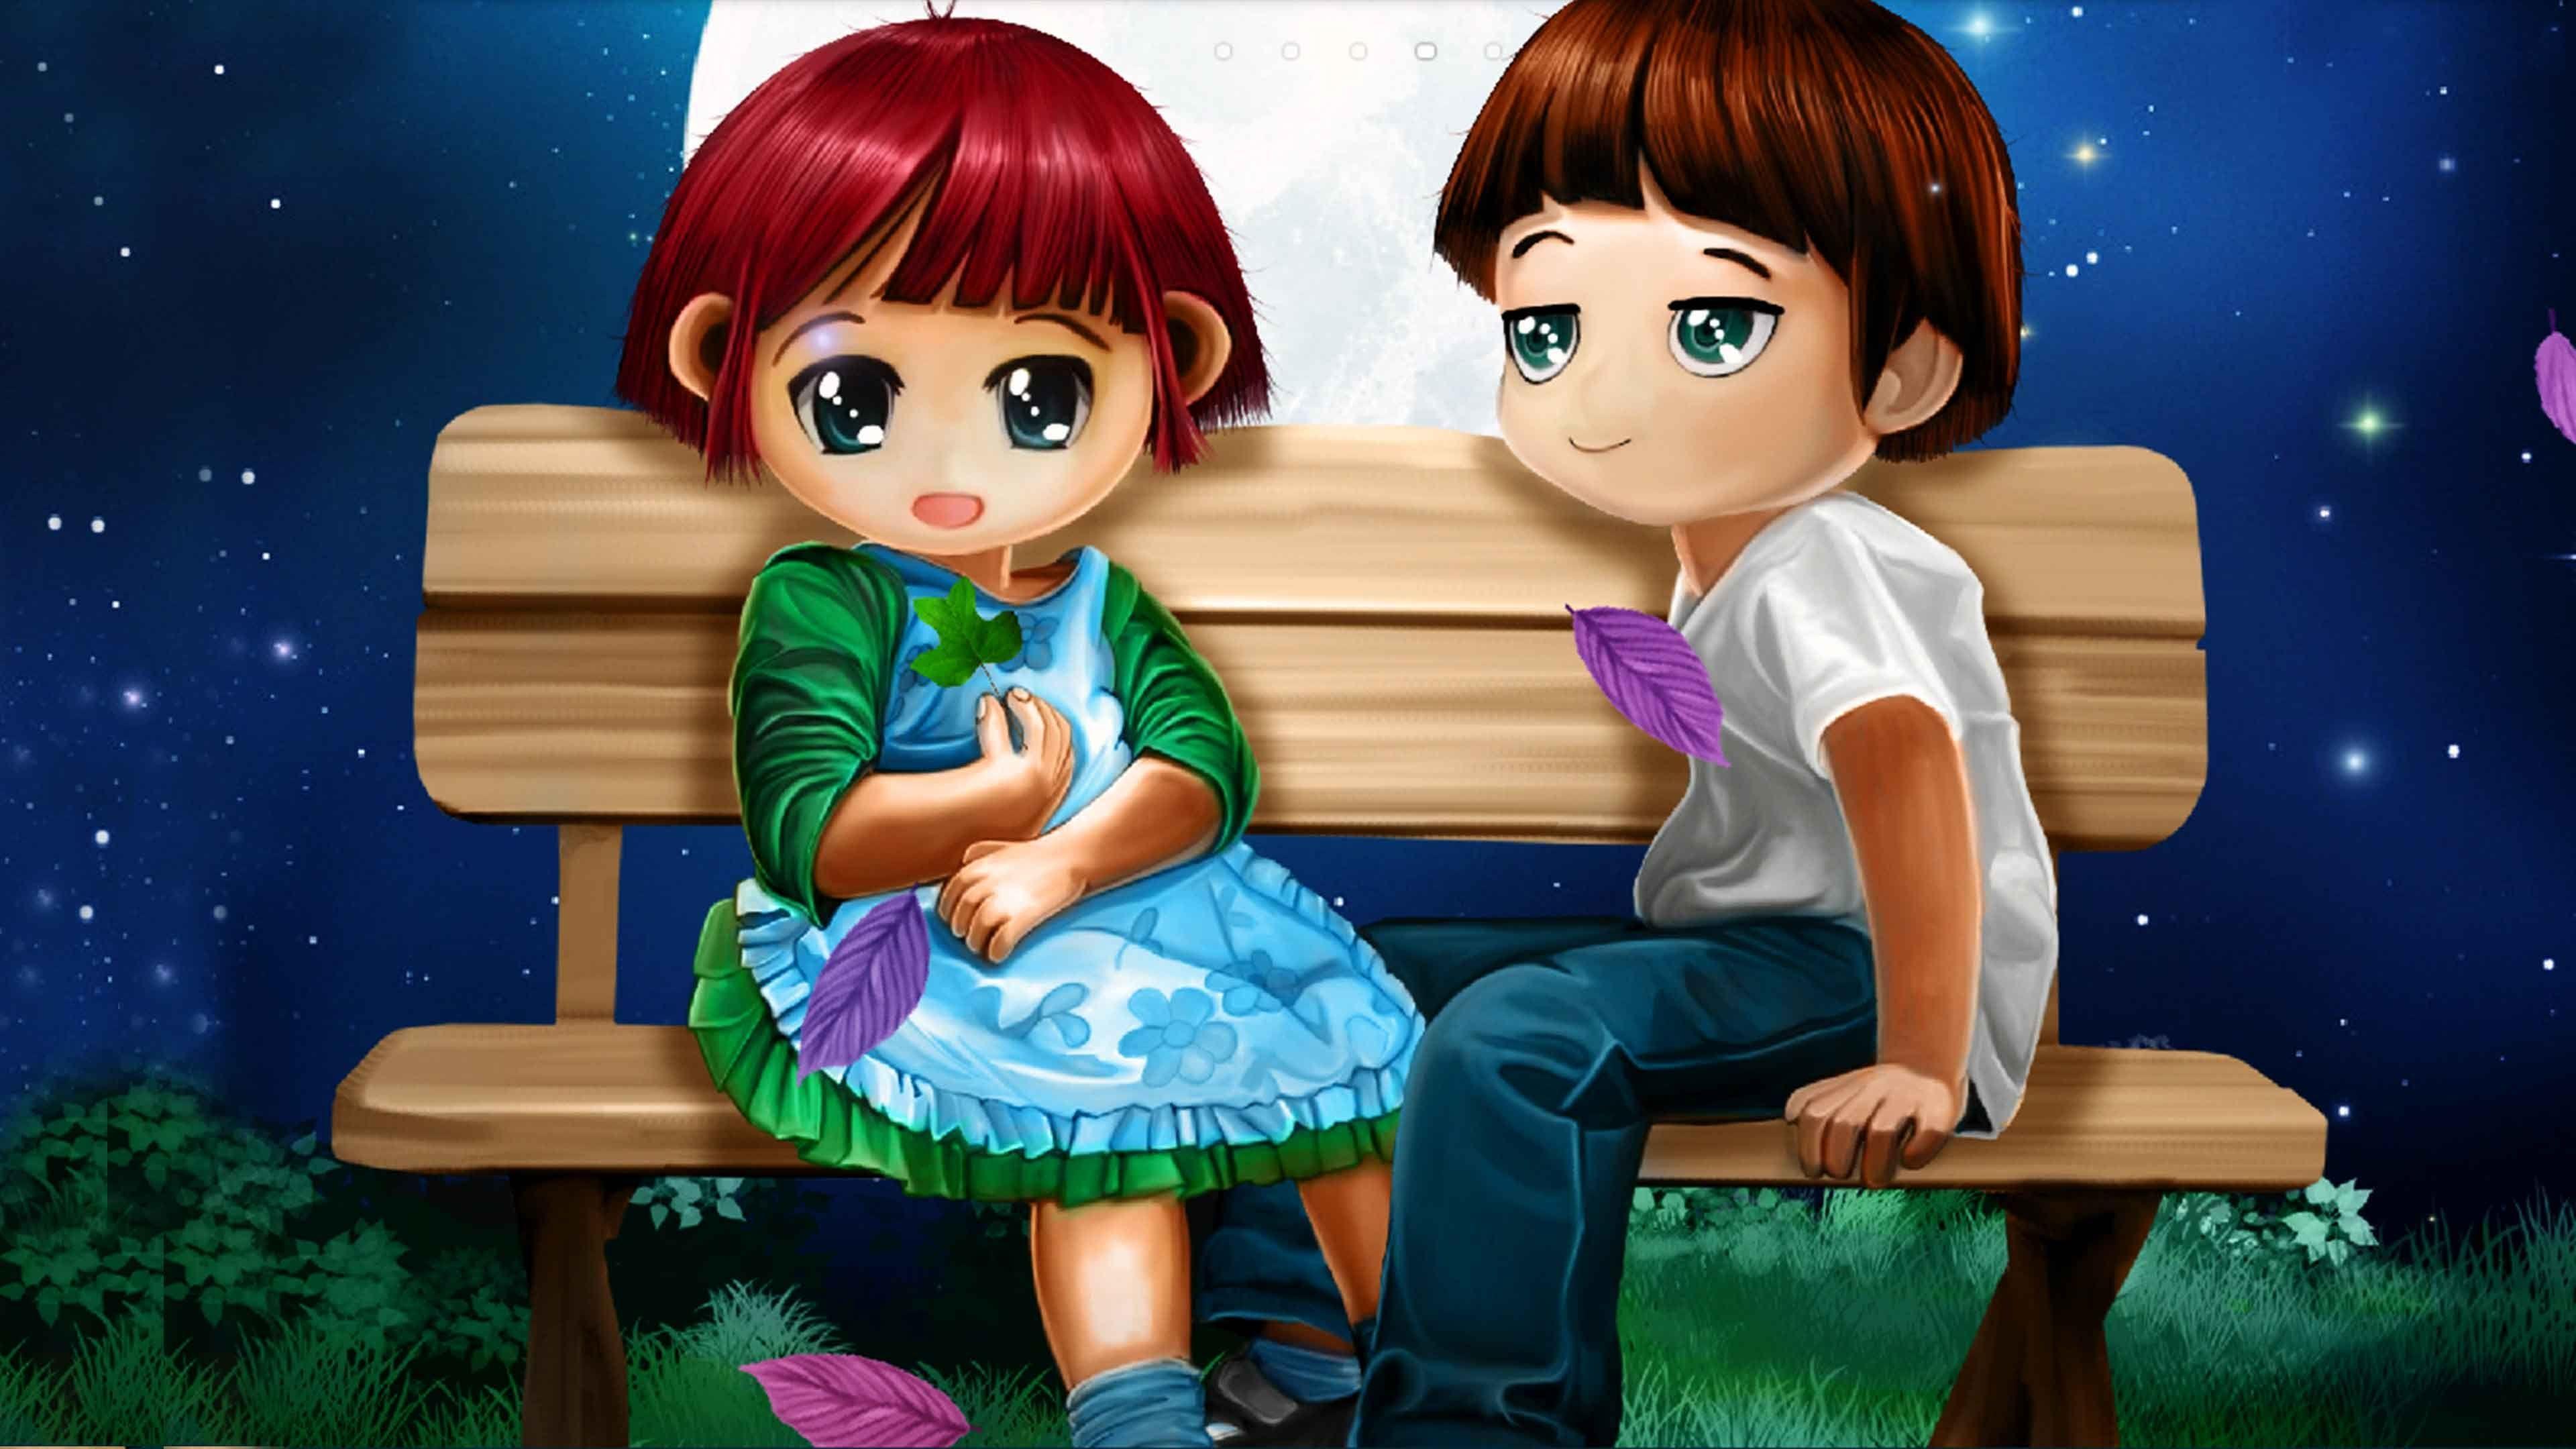 Luxury cute animated couple wallpaper anime wp